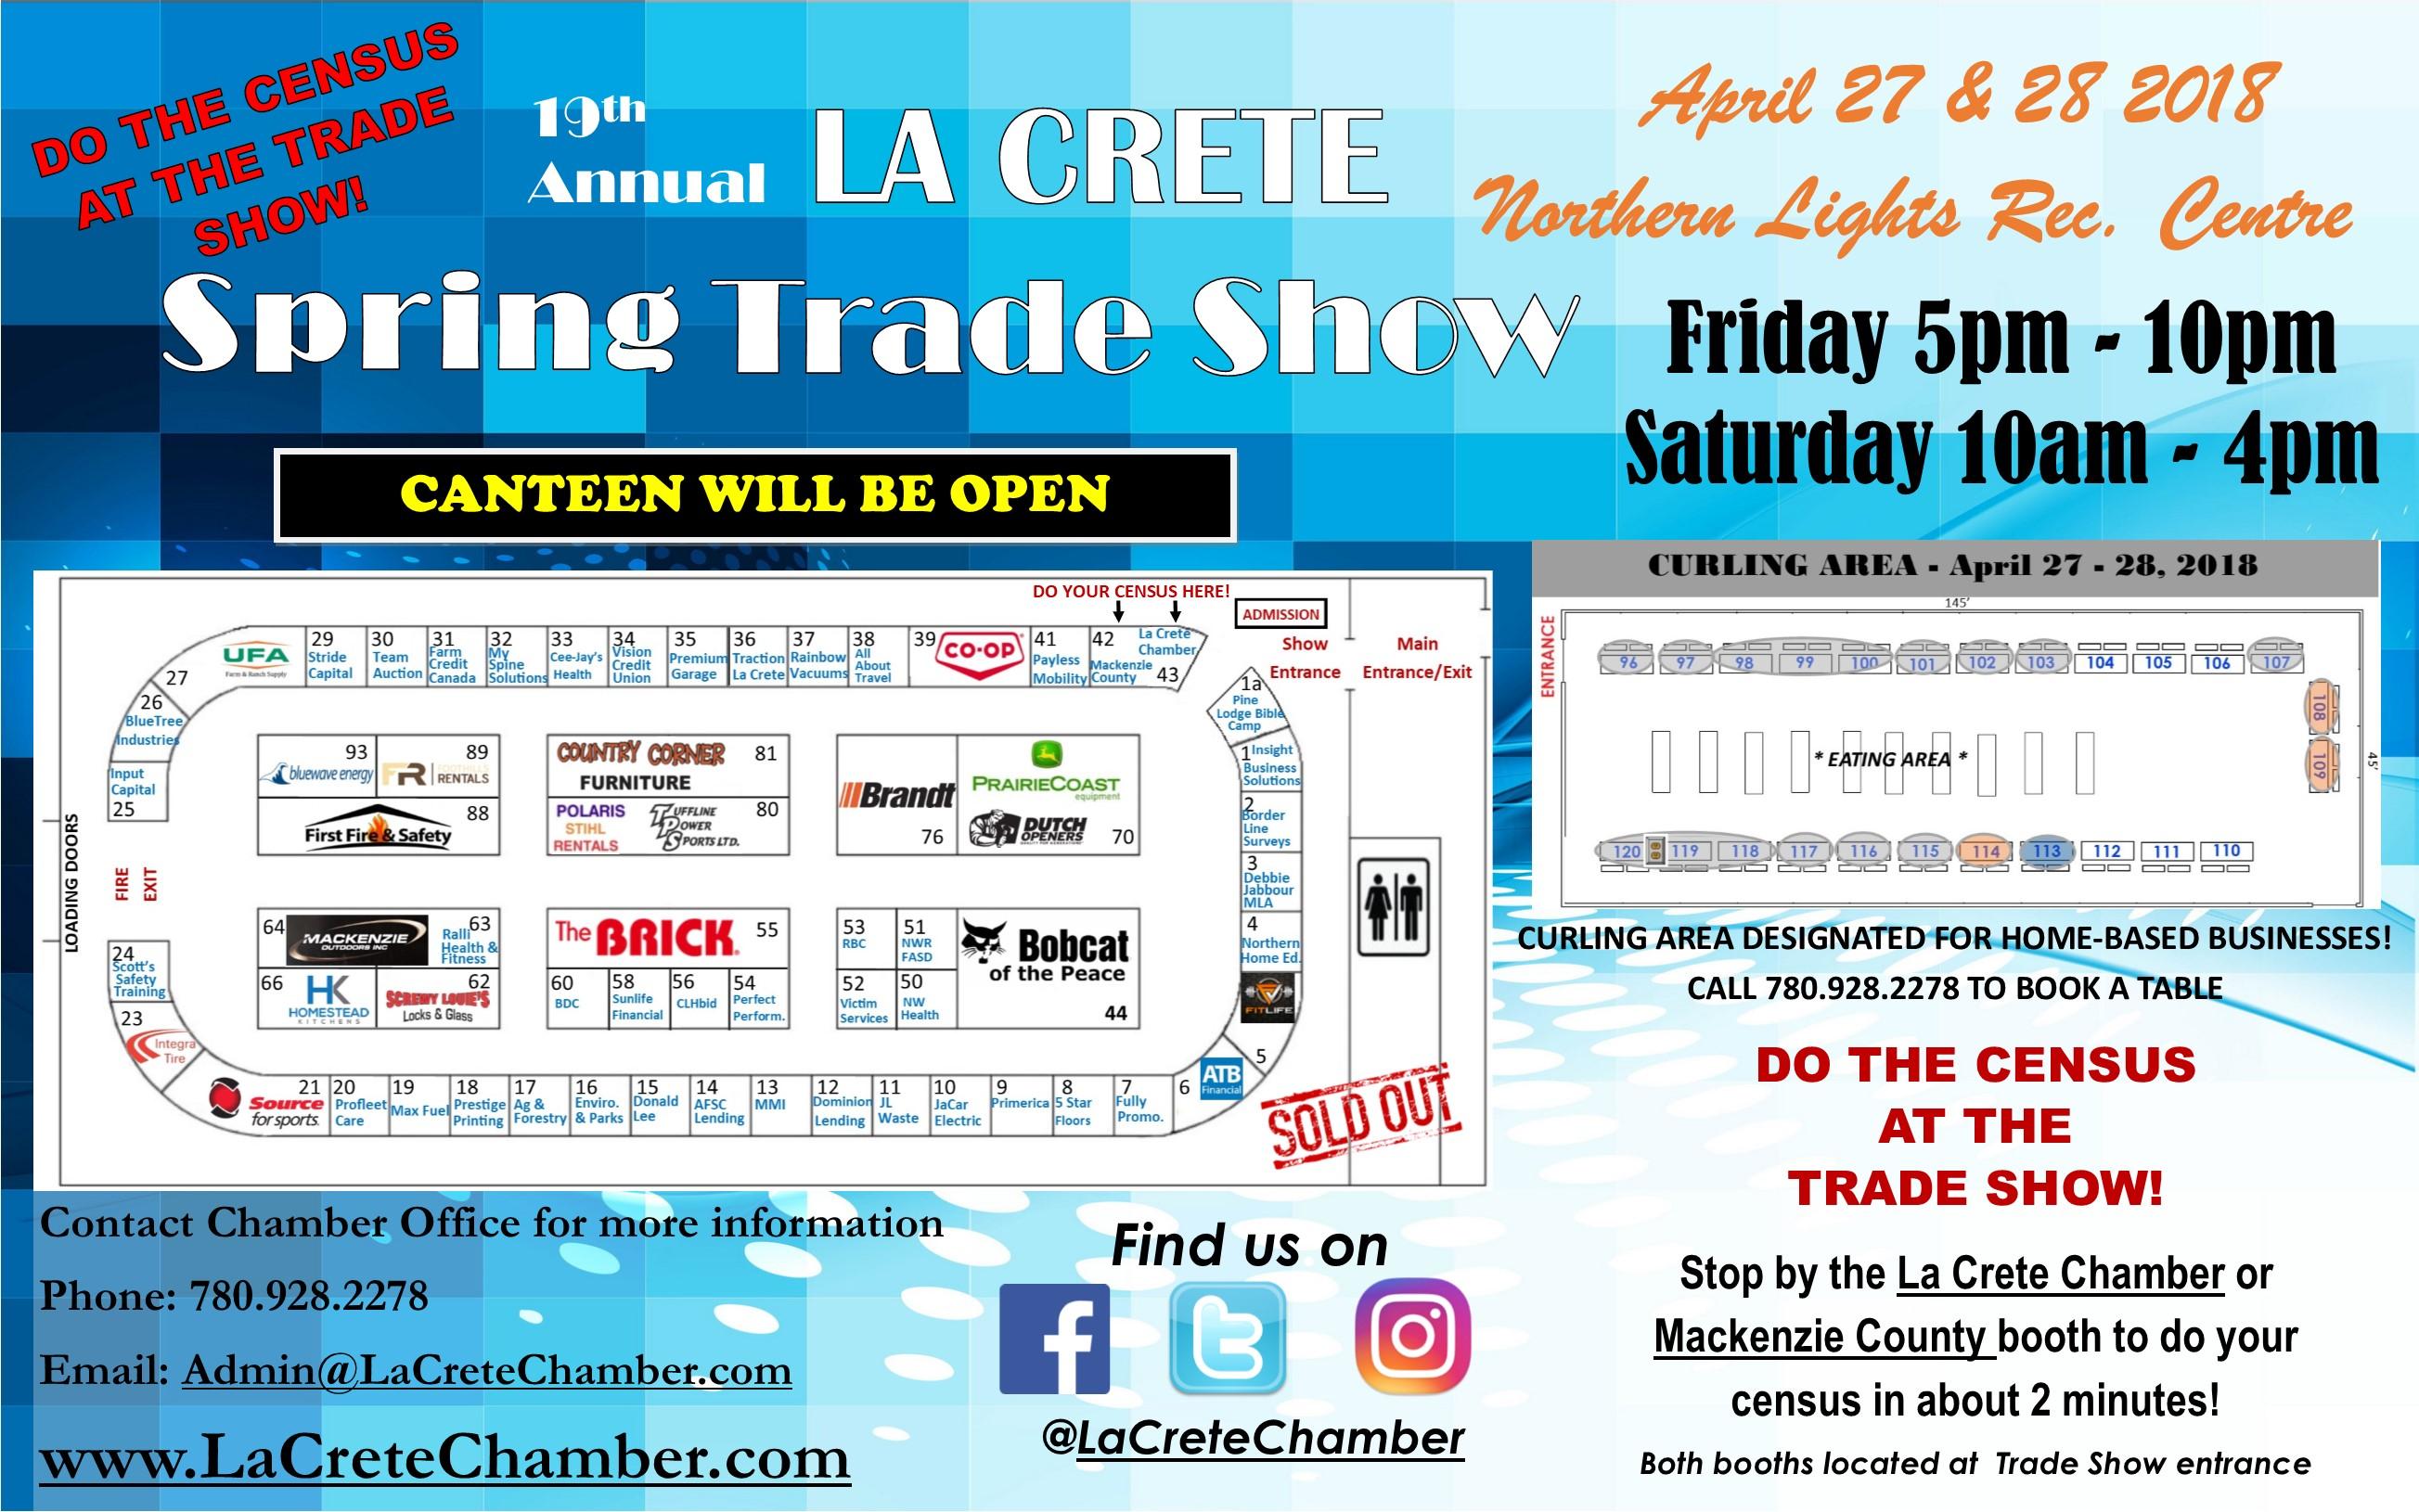 La Crete Spring Trade Show Poster 2018 Updated